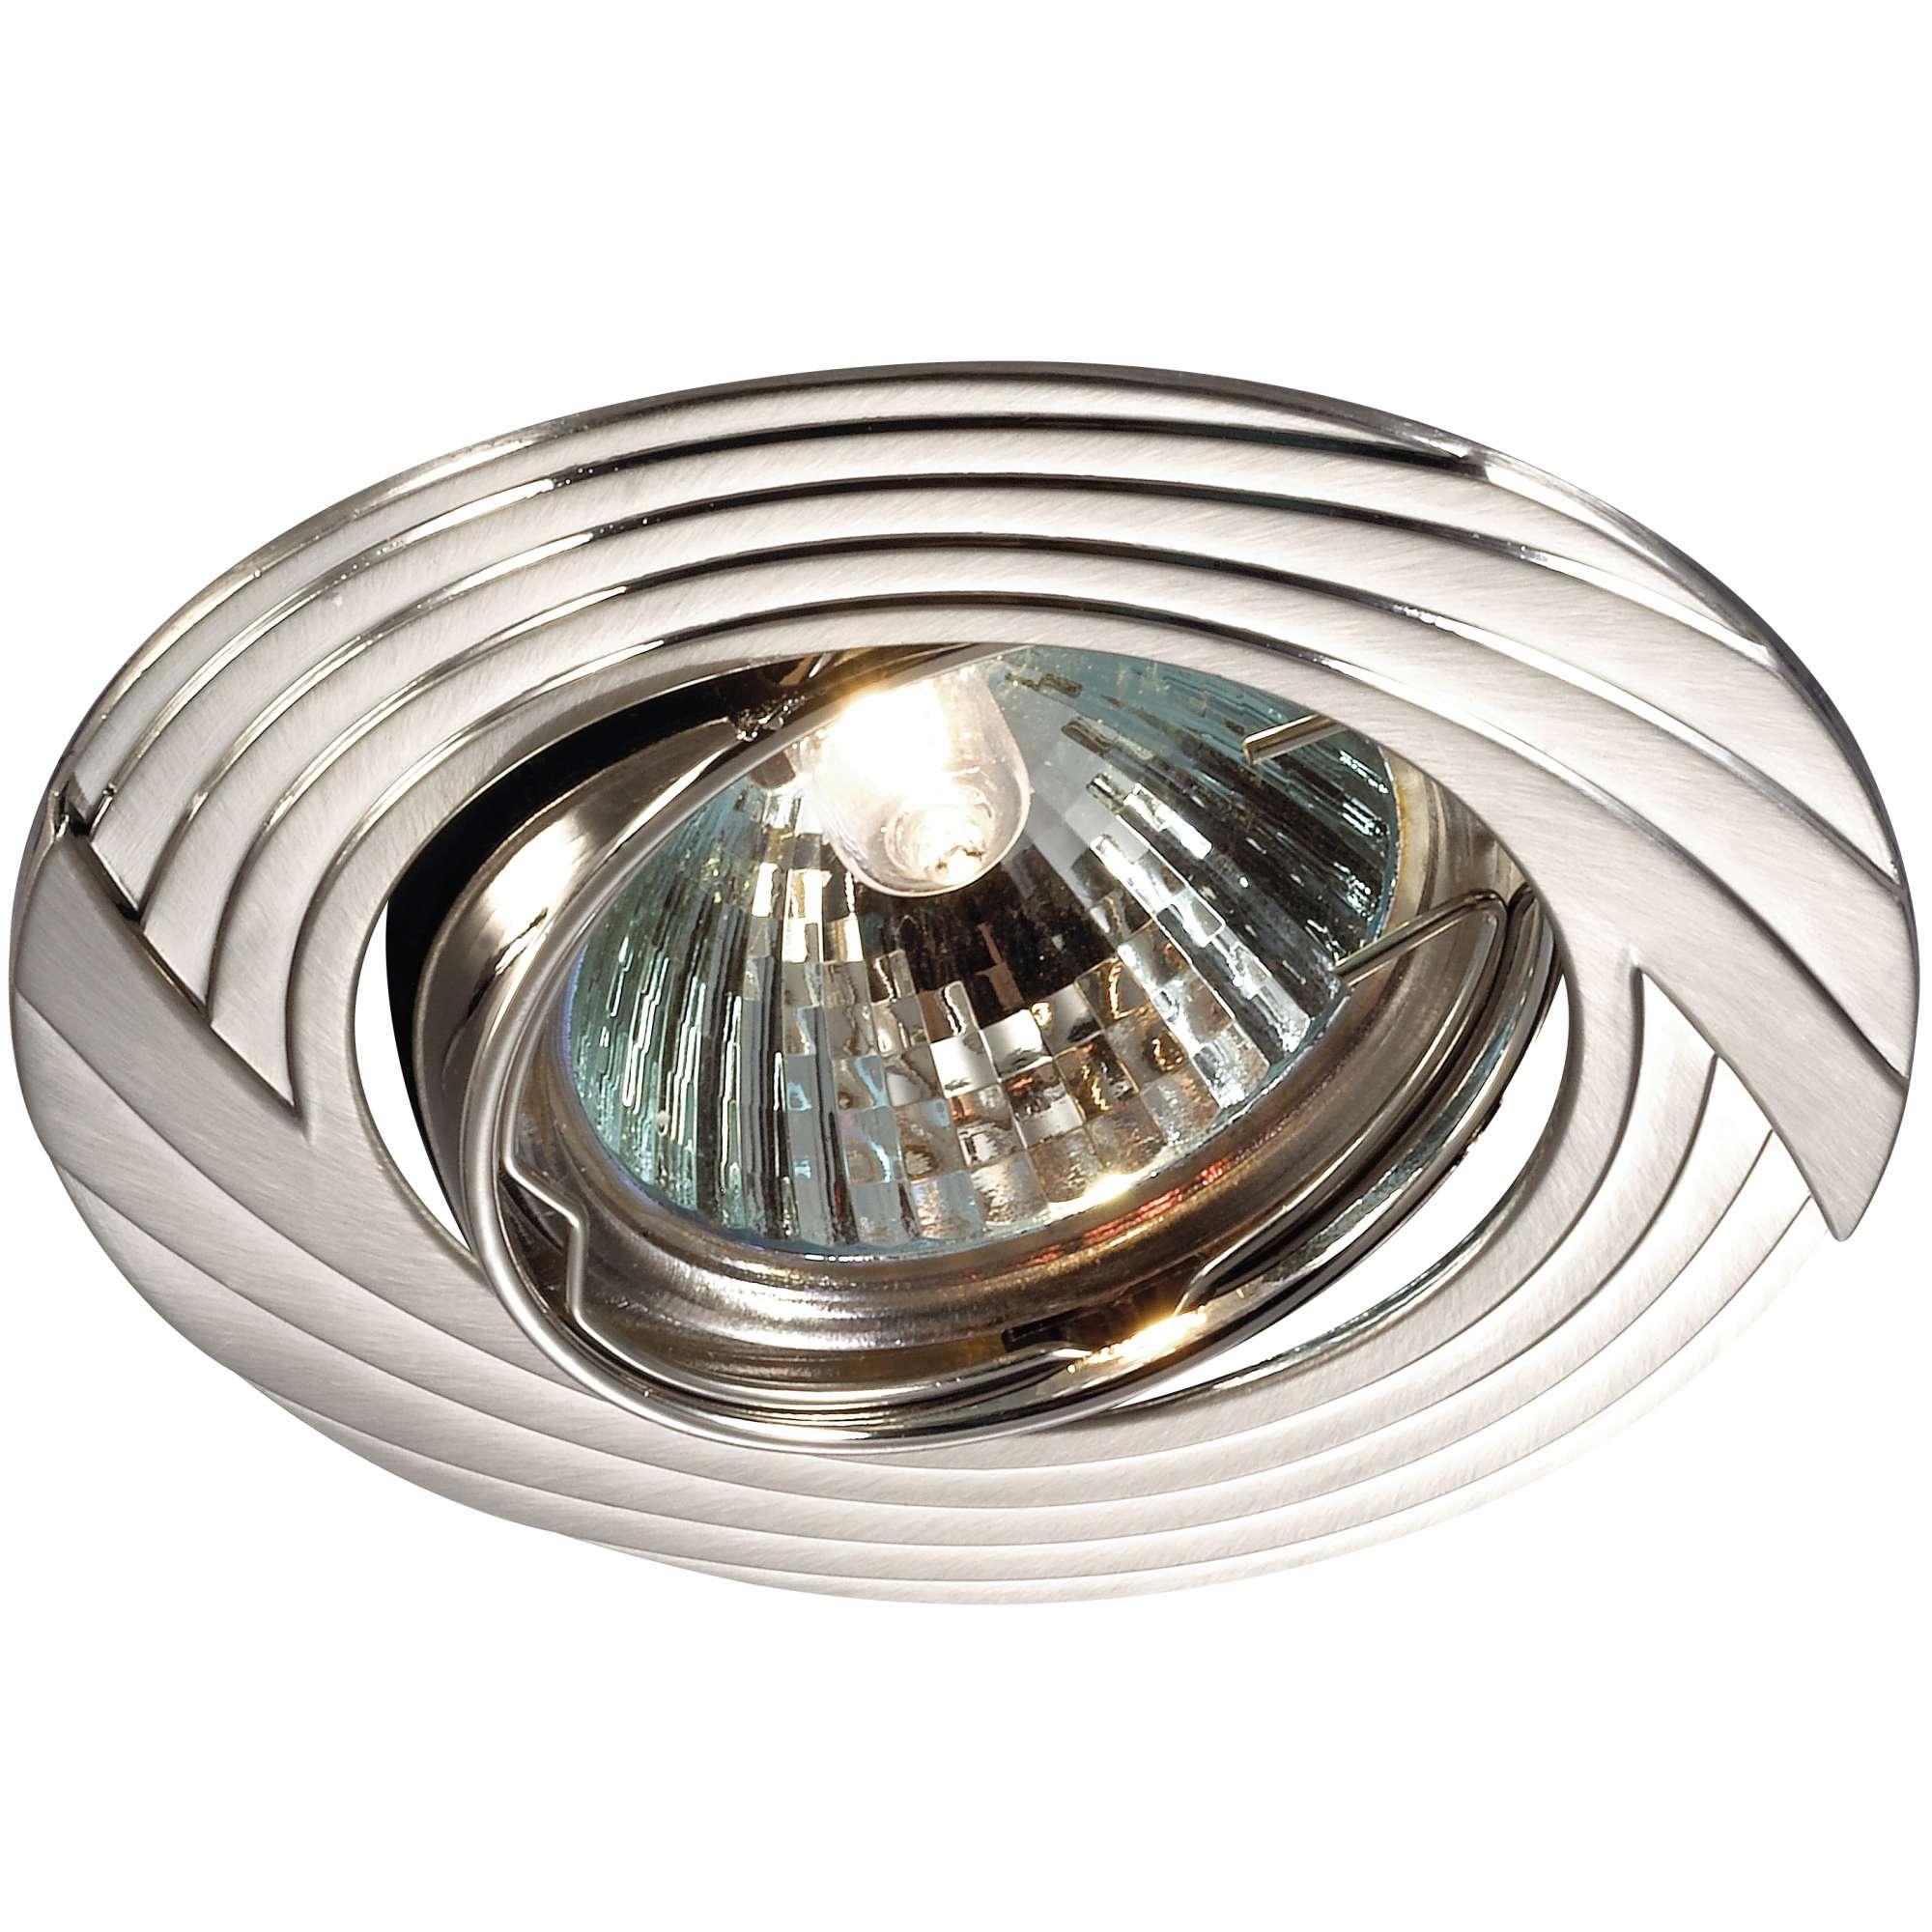 Светильник встраиваемый NovotechСветильники встраиваемые<br>Стиль светильника: модерн,<br>Диаметр: 82,<br>Форма светильника: круг,<br>Материал светильника: металл,<br>Количество ламп: 1,<br>Тип лампы: галогенная,<br>Мощность: 50,<br>Патрон: GX5.3,<br>Цвет арматуры: никель,<br>Назначение светильника: для комнаты<br>